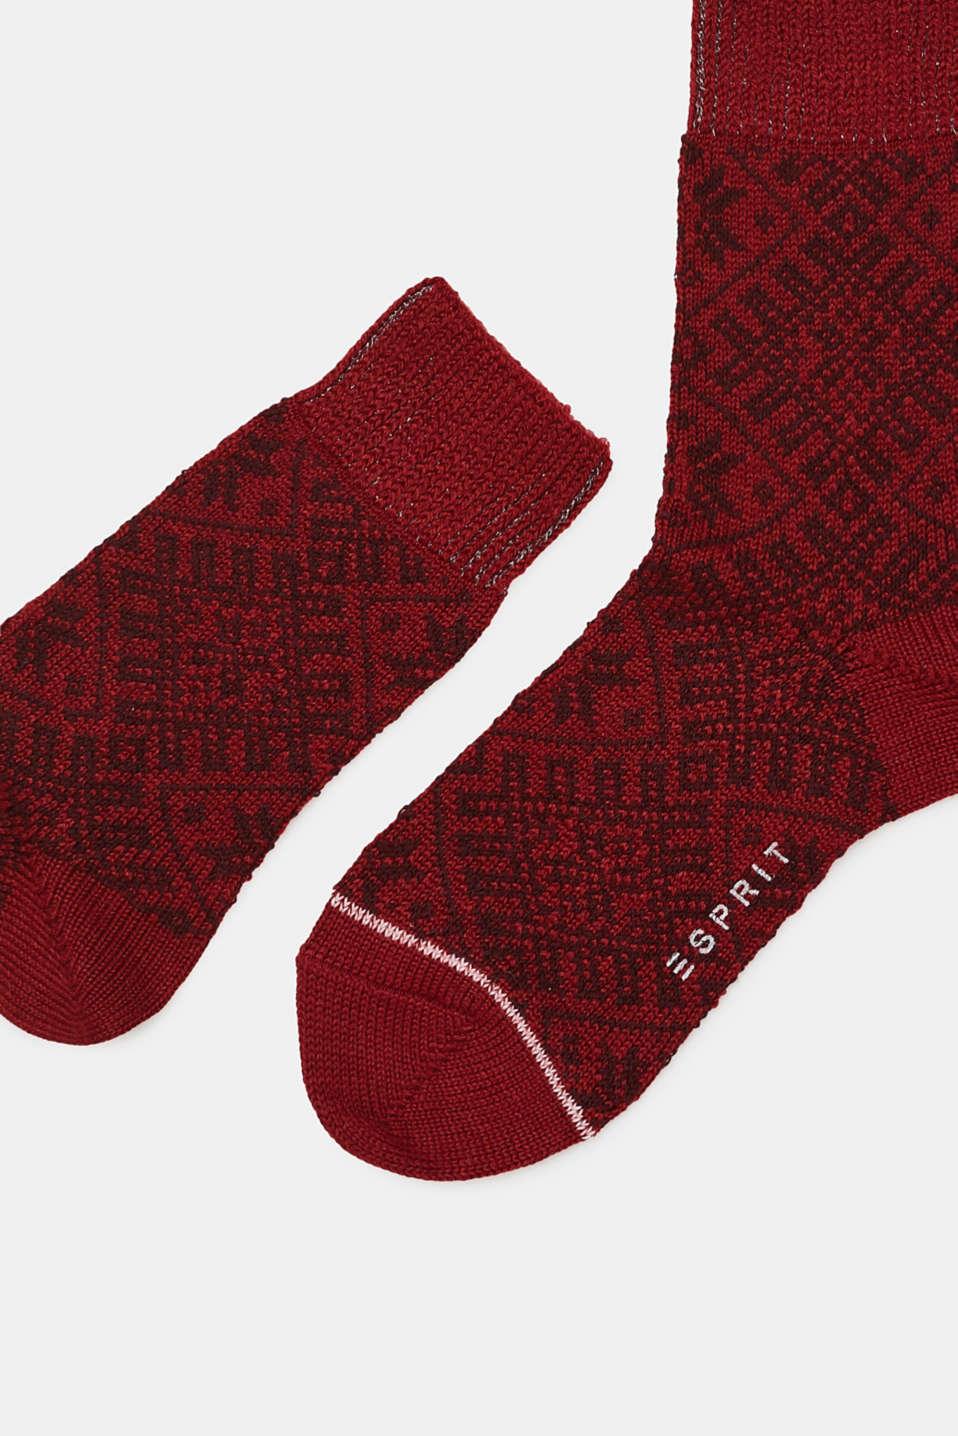 Wool blend: boot socks with a Norwegian pattern, BORGOGNA, detail image number 1